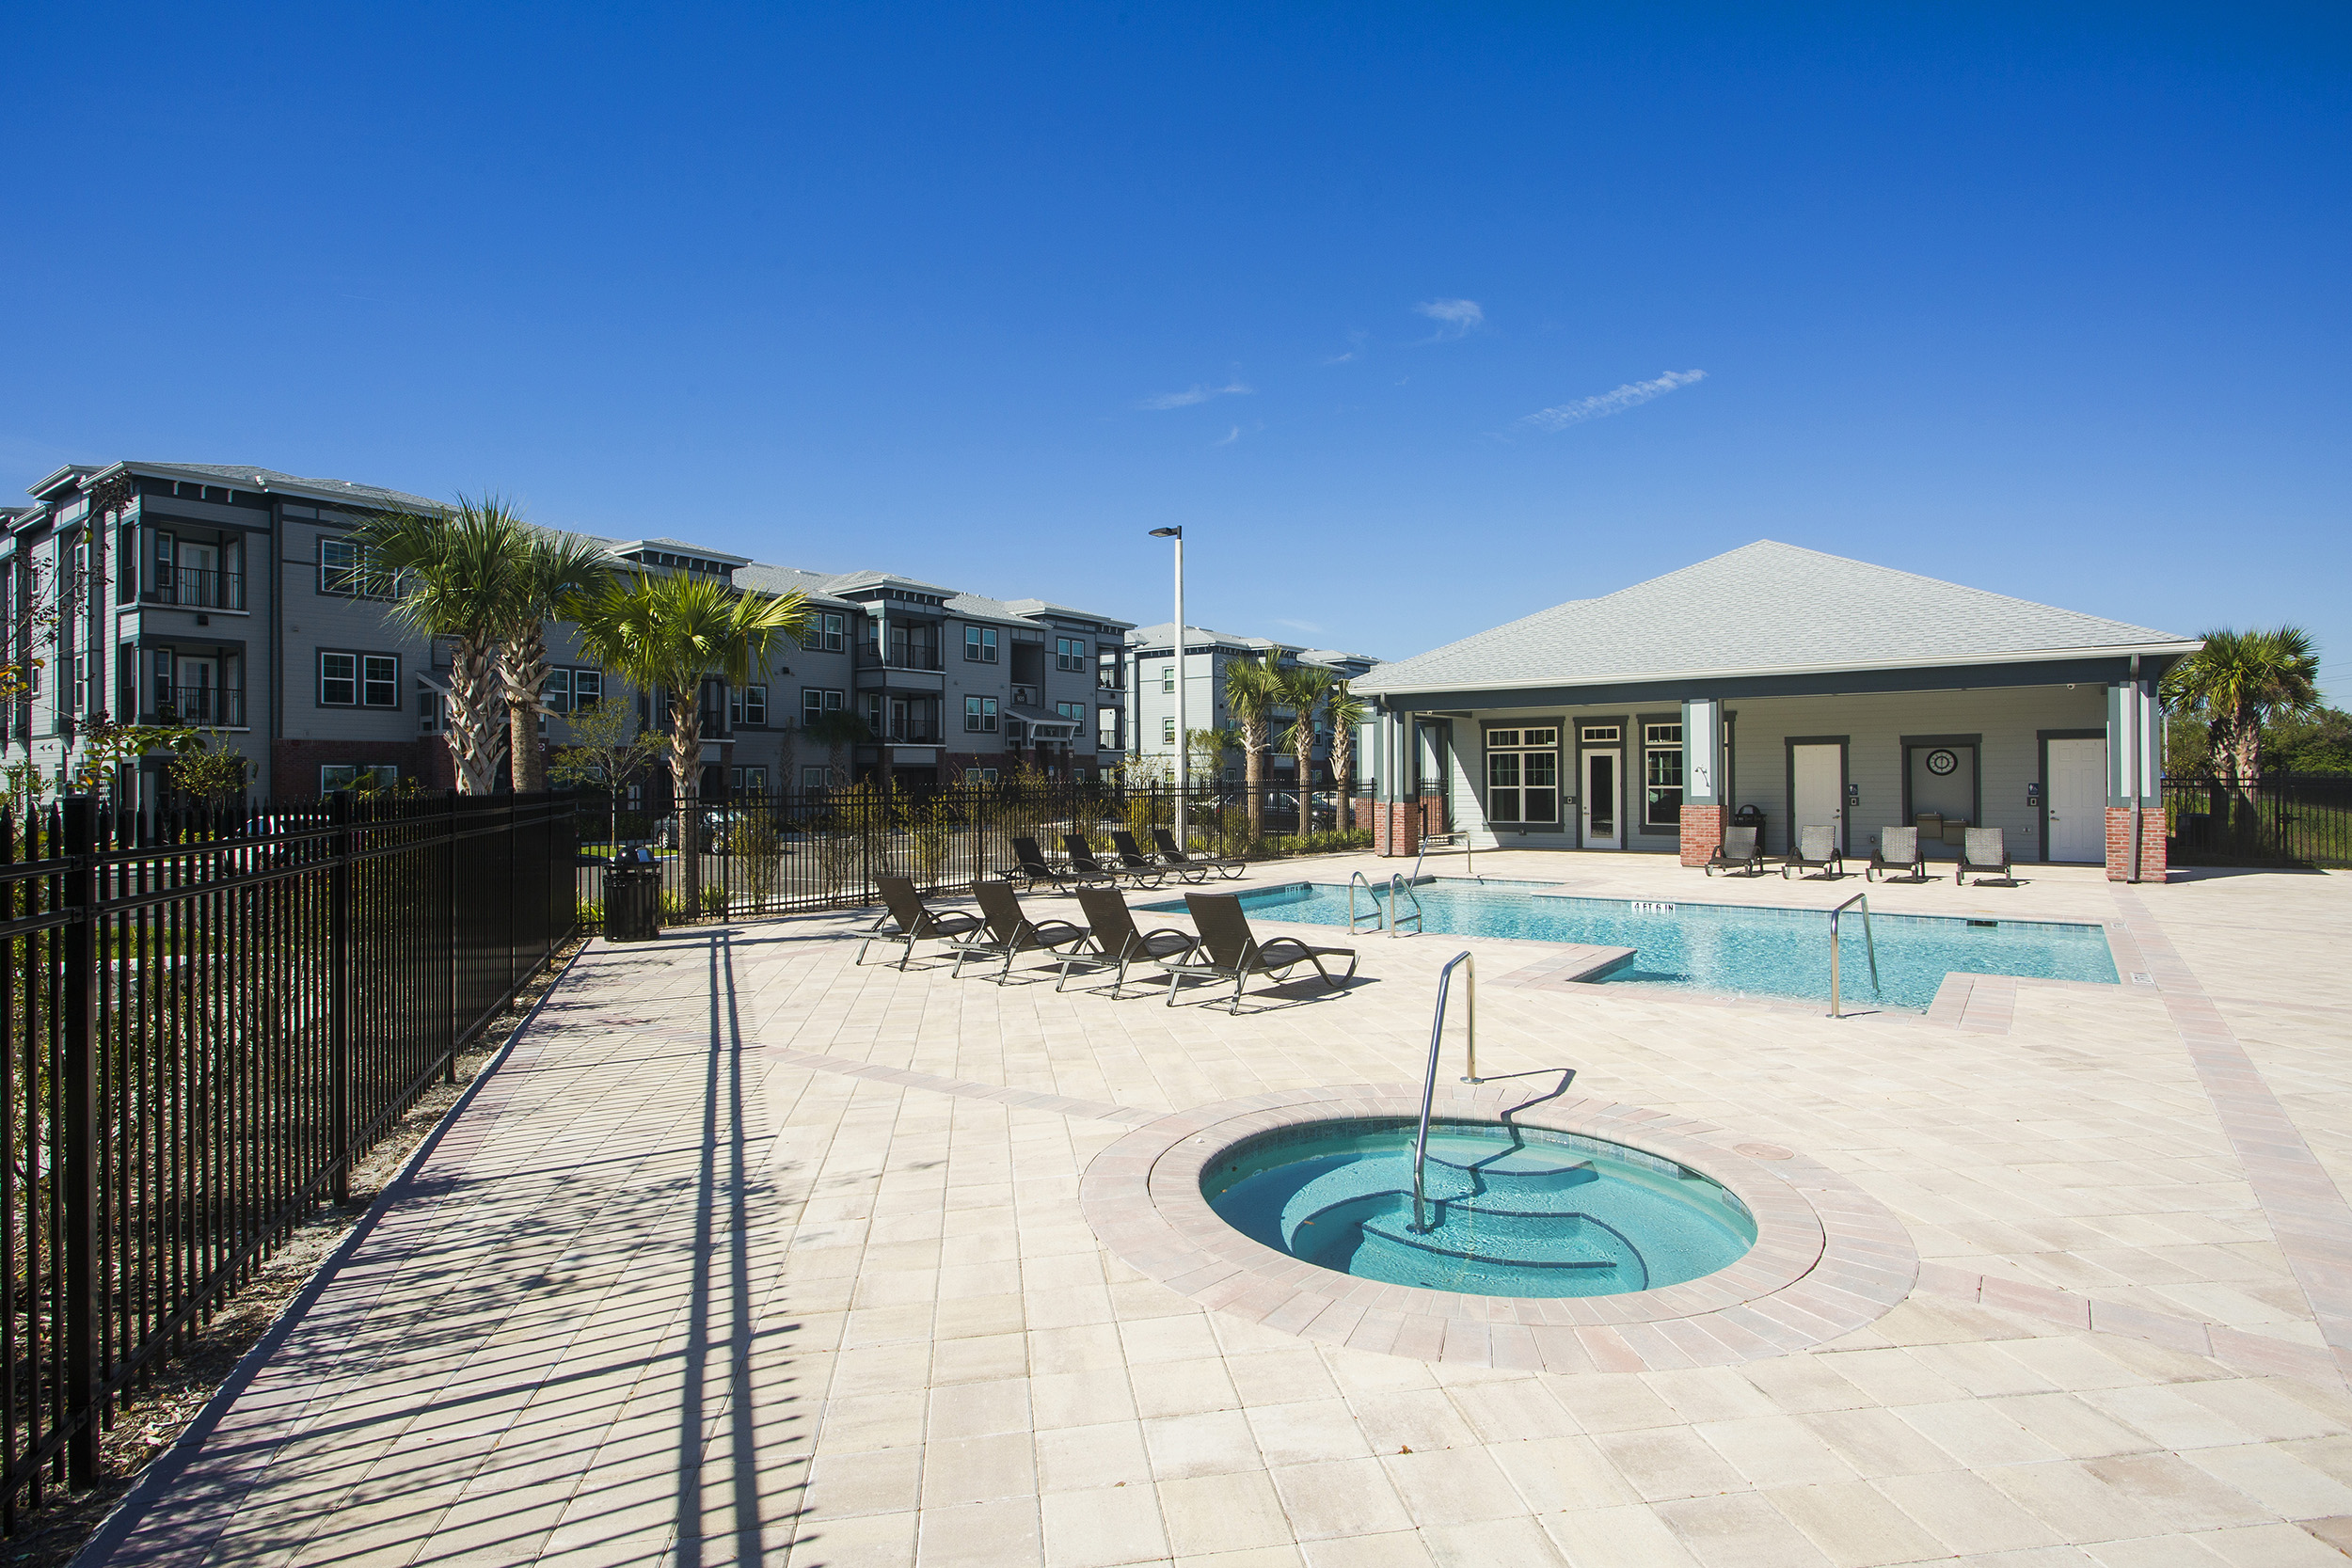 CharlestonEdge-Rental-Apartment-Brandon-Tampa-Florida-Pool-Bedrooms-Pool-3.jpg